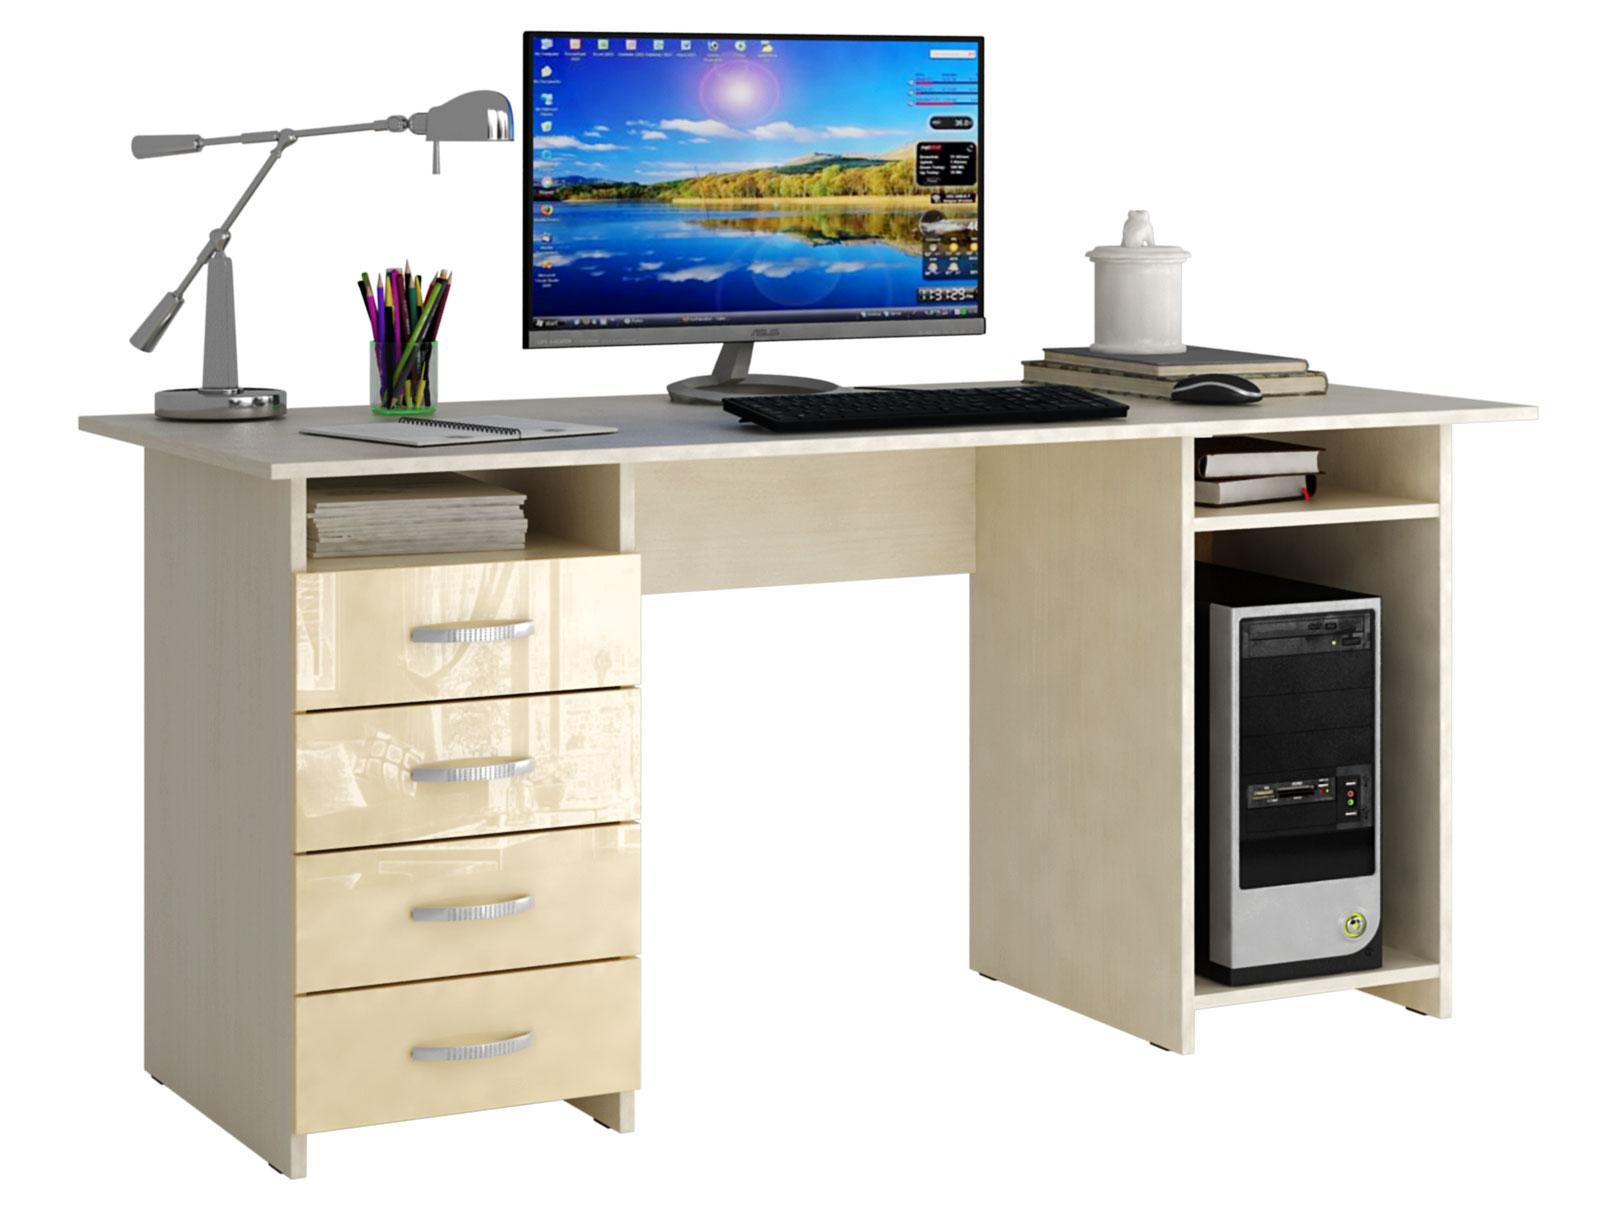 Письменный стол МФ Мастер МСТ-СДМ-06-ГЛ Милан-6 глянец дуб молочный, бежевый глянец